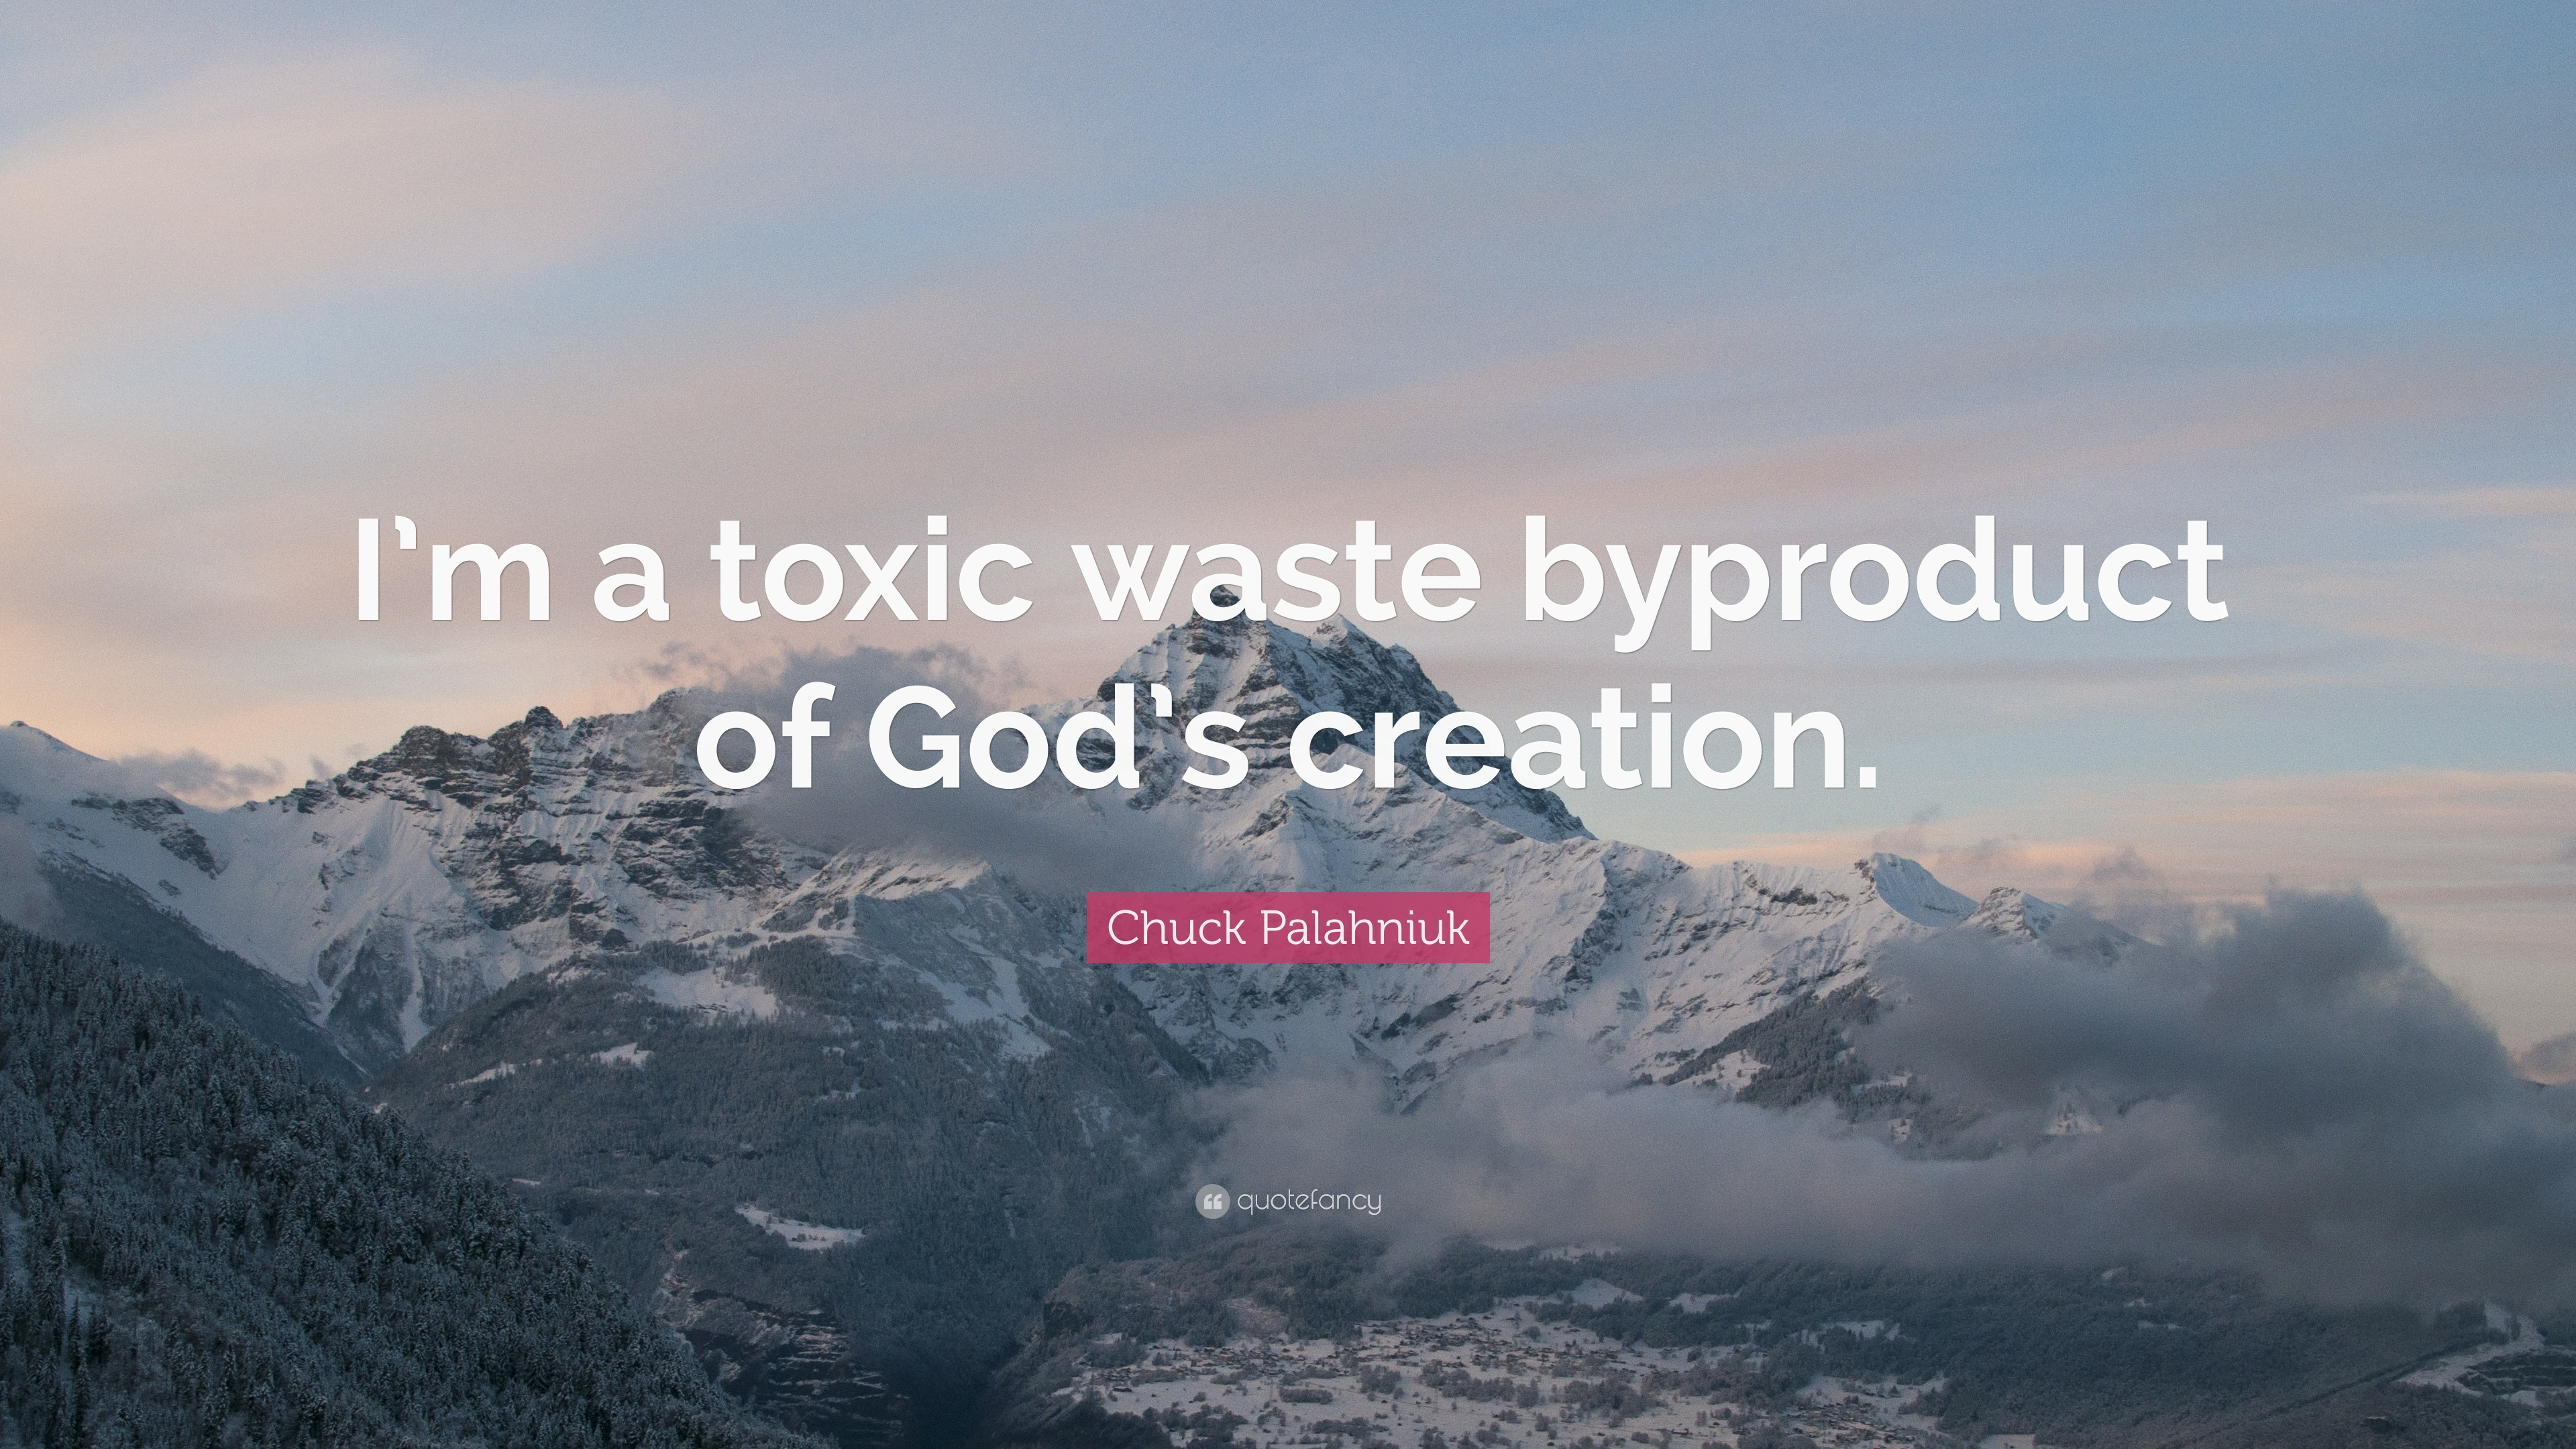 chuck palahniuk quote u201ci u0027m a toxic waste byproduct of god u0027s